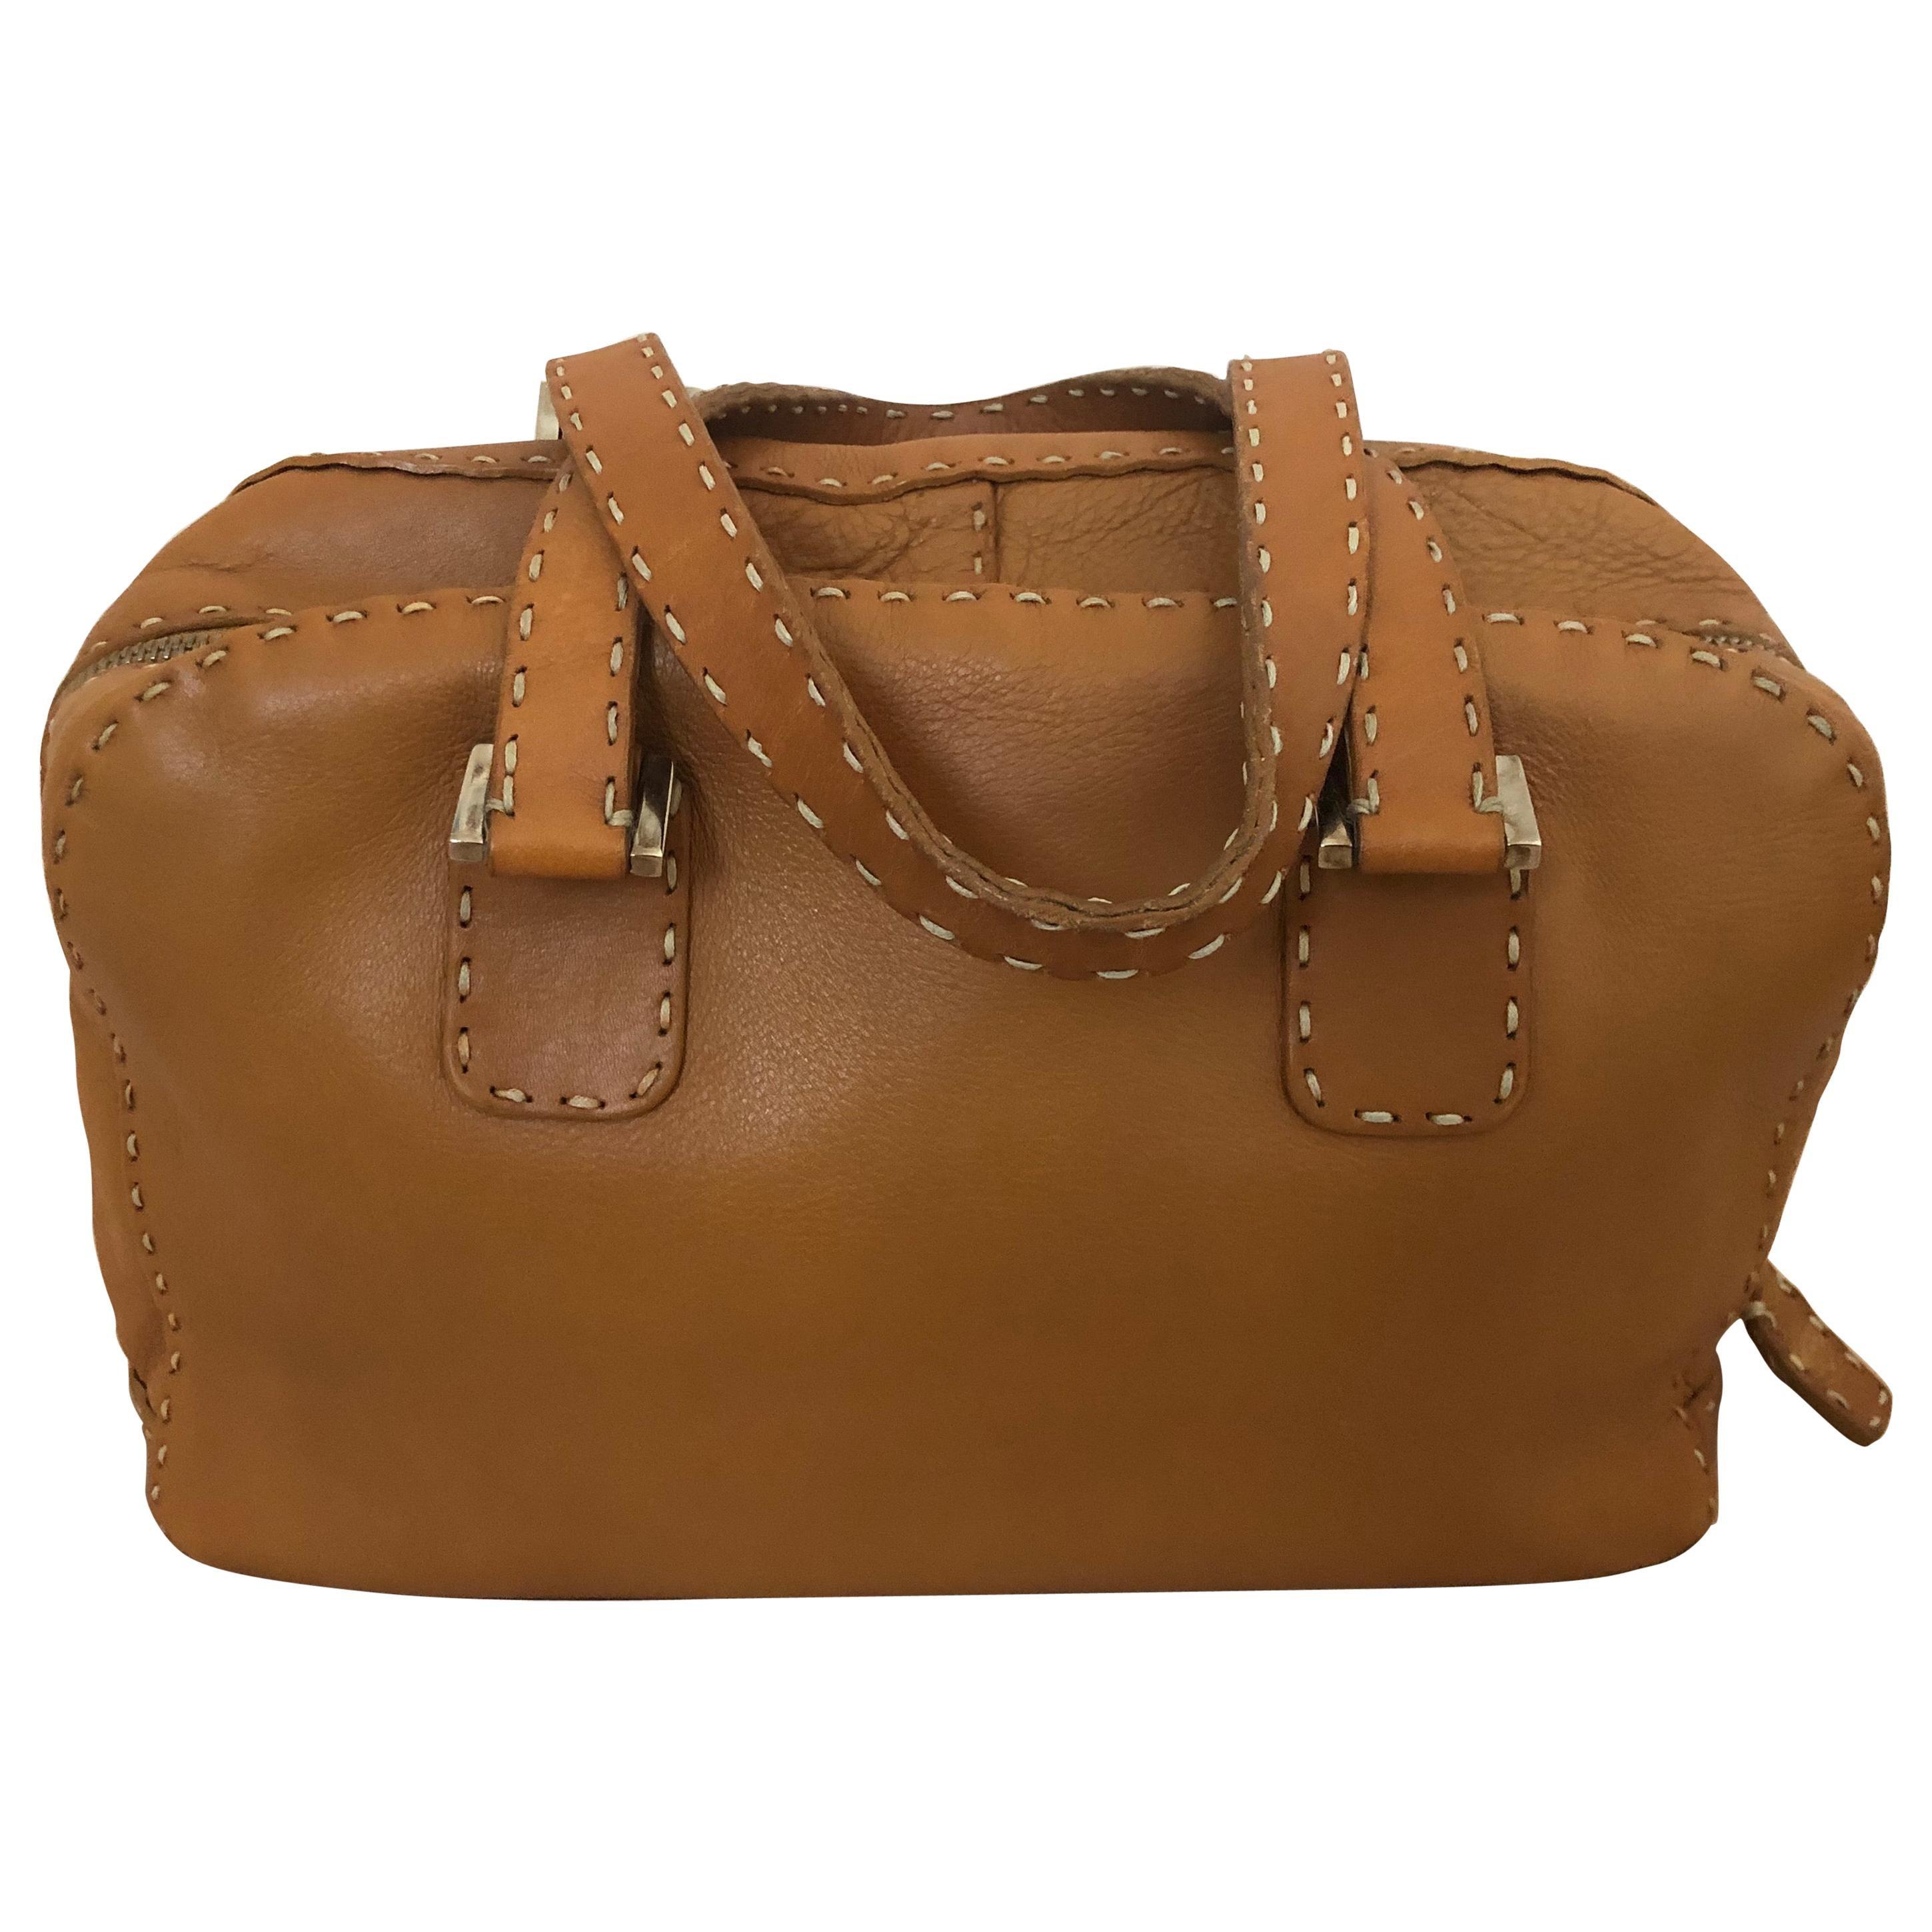 Fendi Tan Grain Leather Selleria Wide Top Stitch Handbag